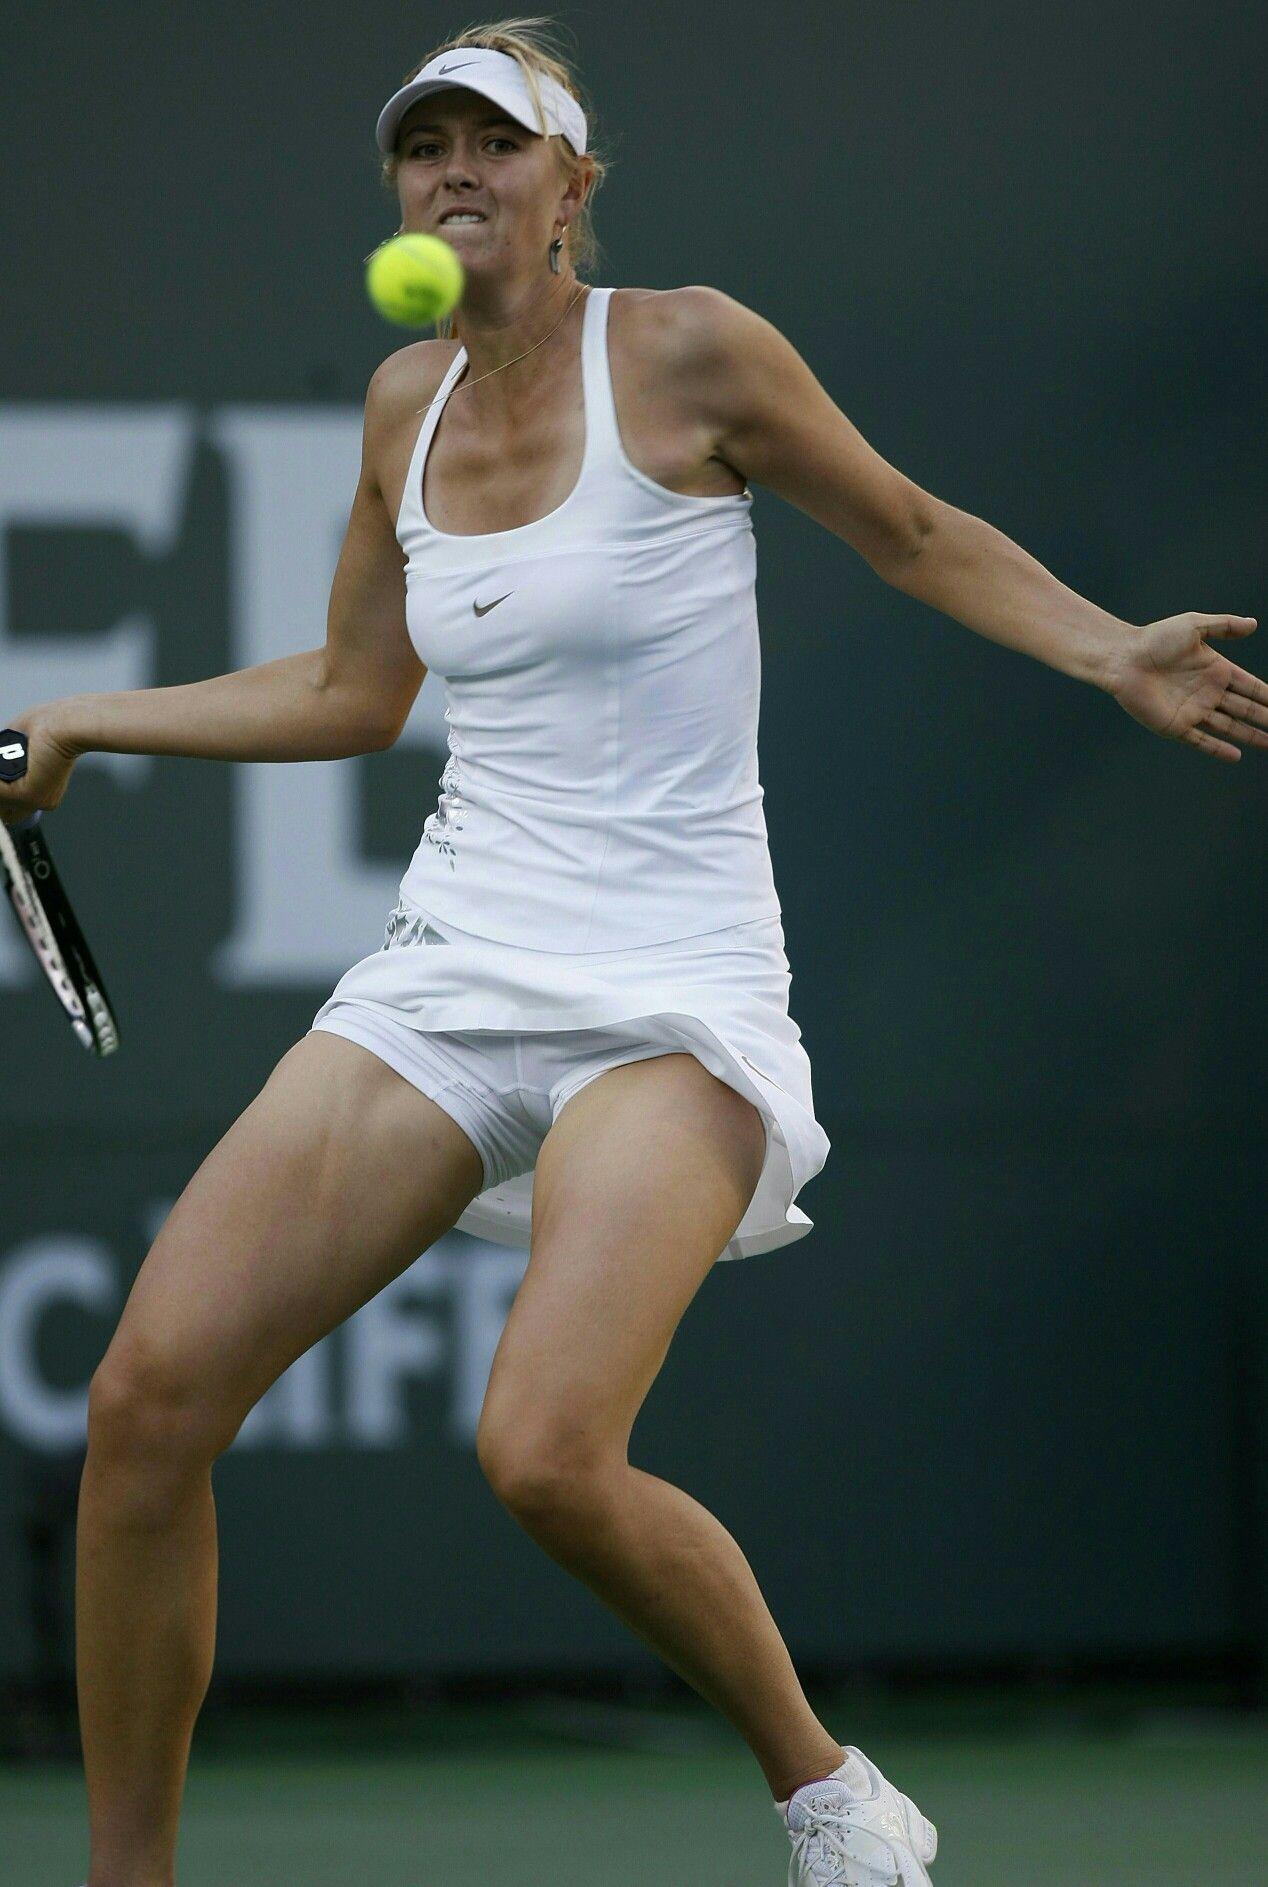 Tennis Women Players - Upskirt and underwear peeks 114